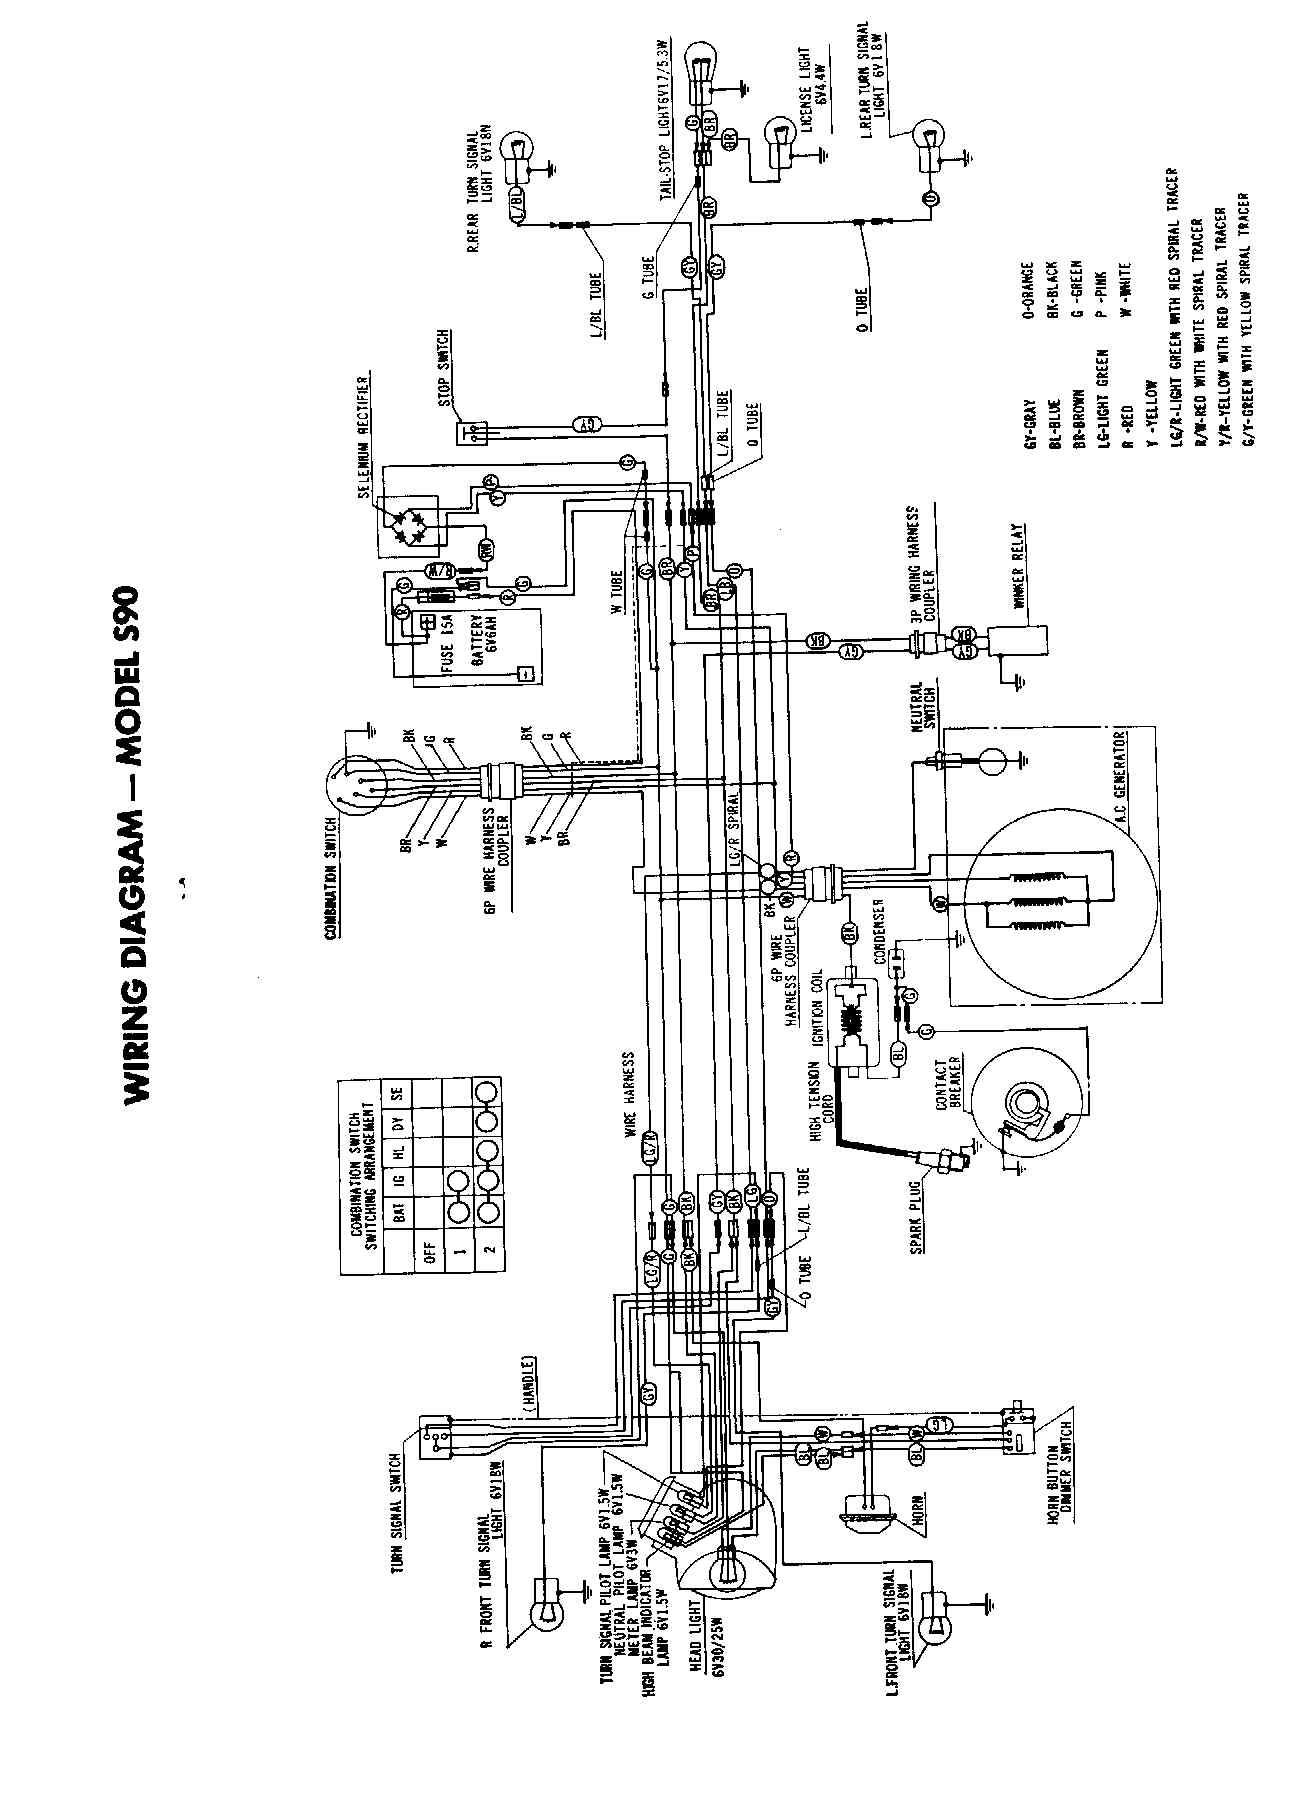 DO_7821] Honda Xl70 Wiring Diagram Honda Circuit Diagrams Schematic WiringFeren Inama Rosz Inrebe Mohammedshrine Librar Wiring 101